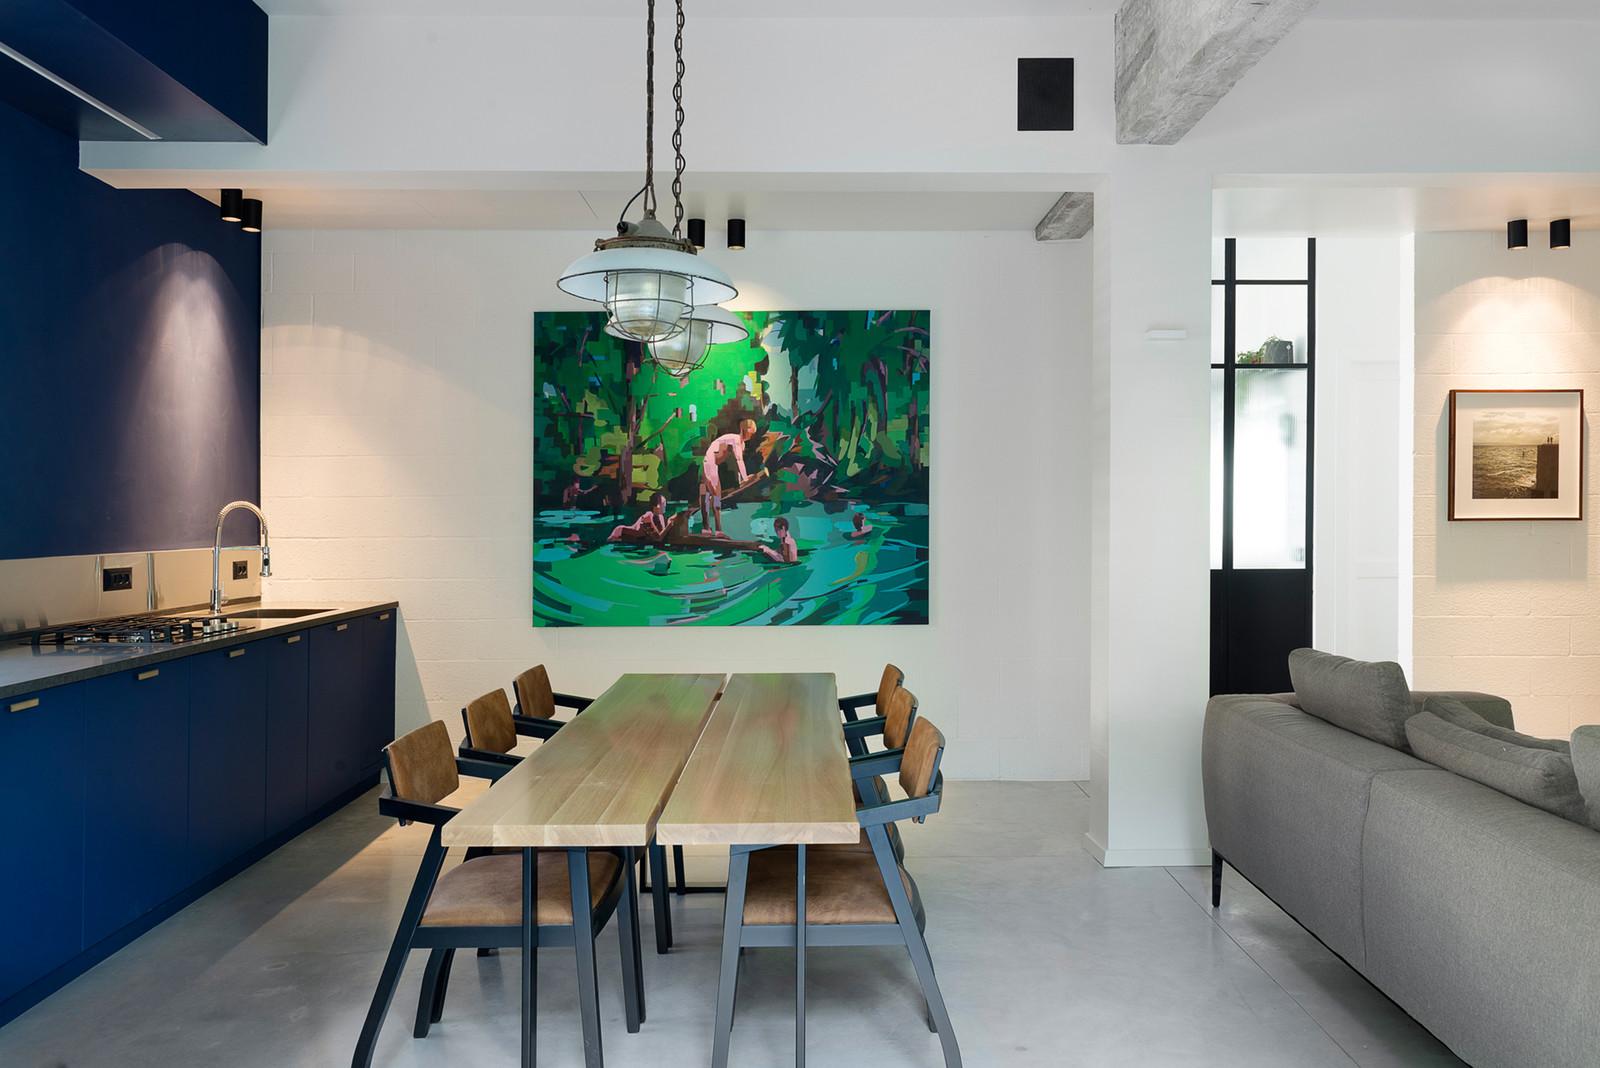 Apartment-renovation-just3ds.com-1